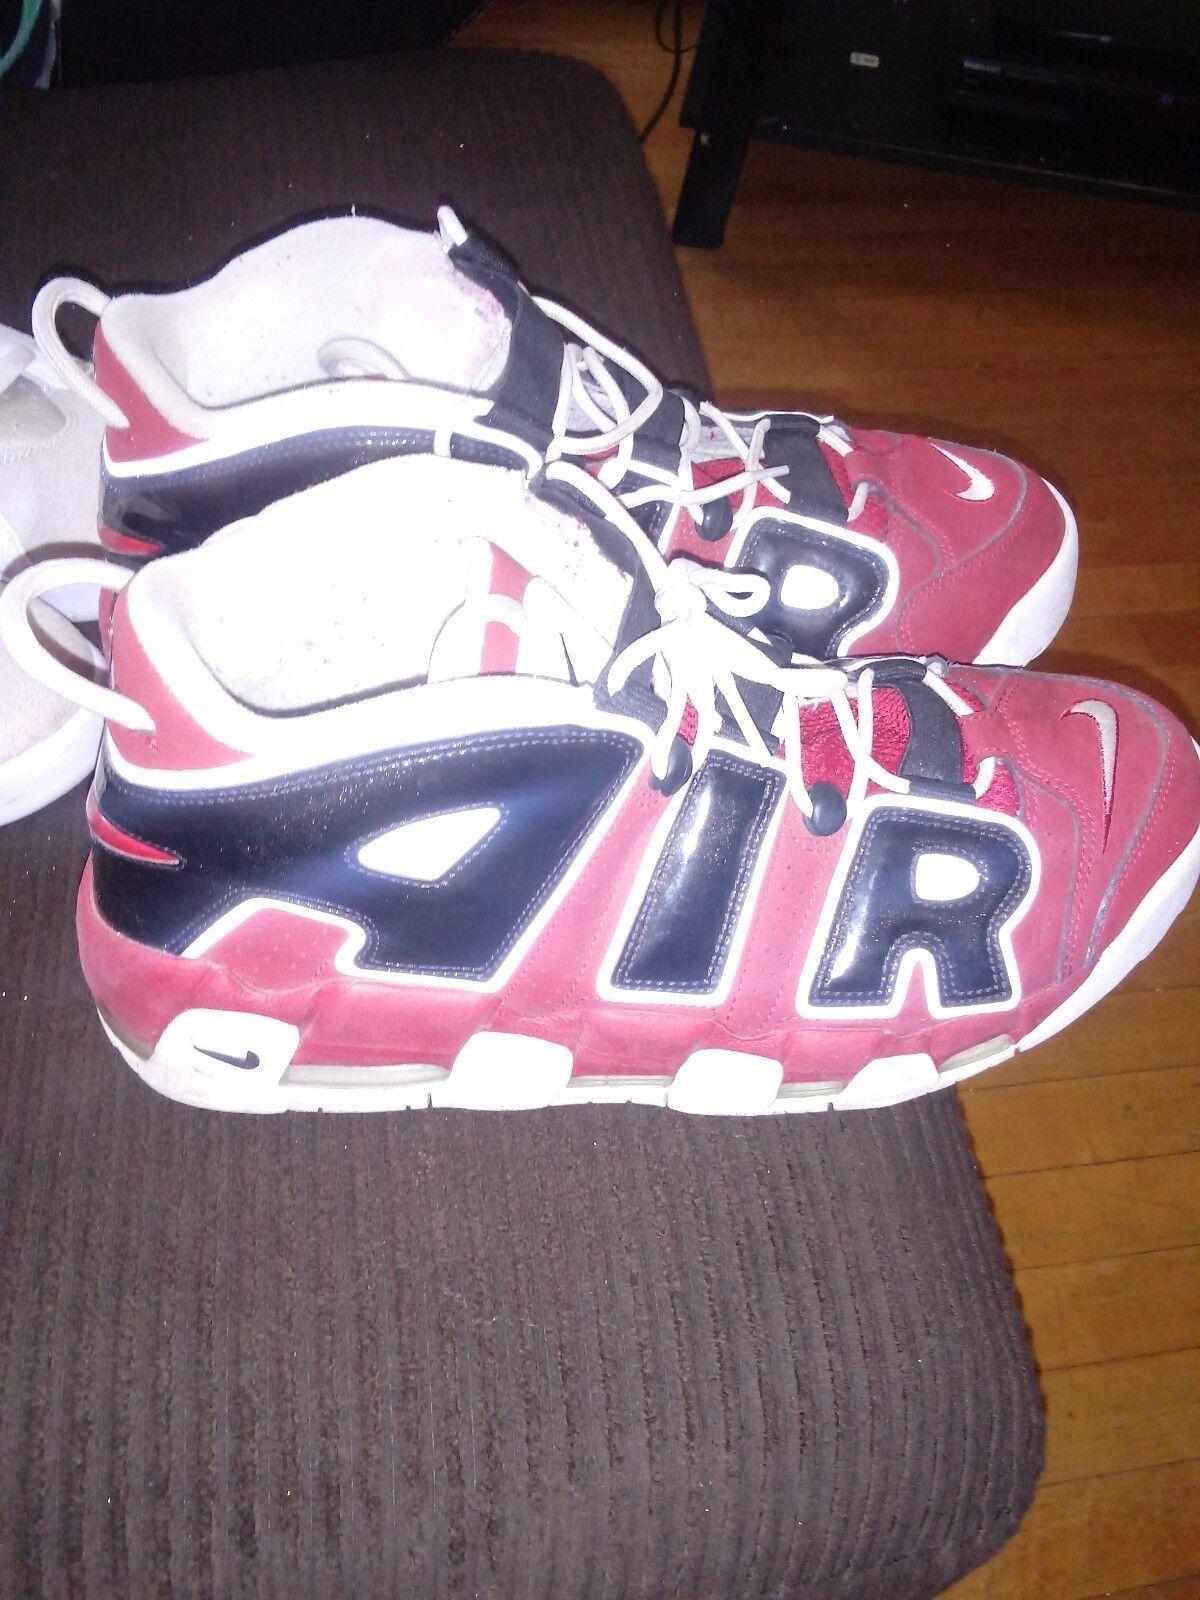 38a84ebc865 Nike air air air uptempo size 13 f82907 - boxing.bender-musik.com